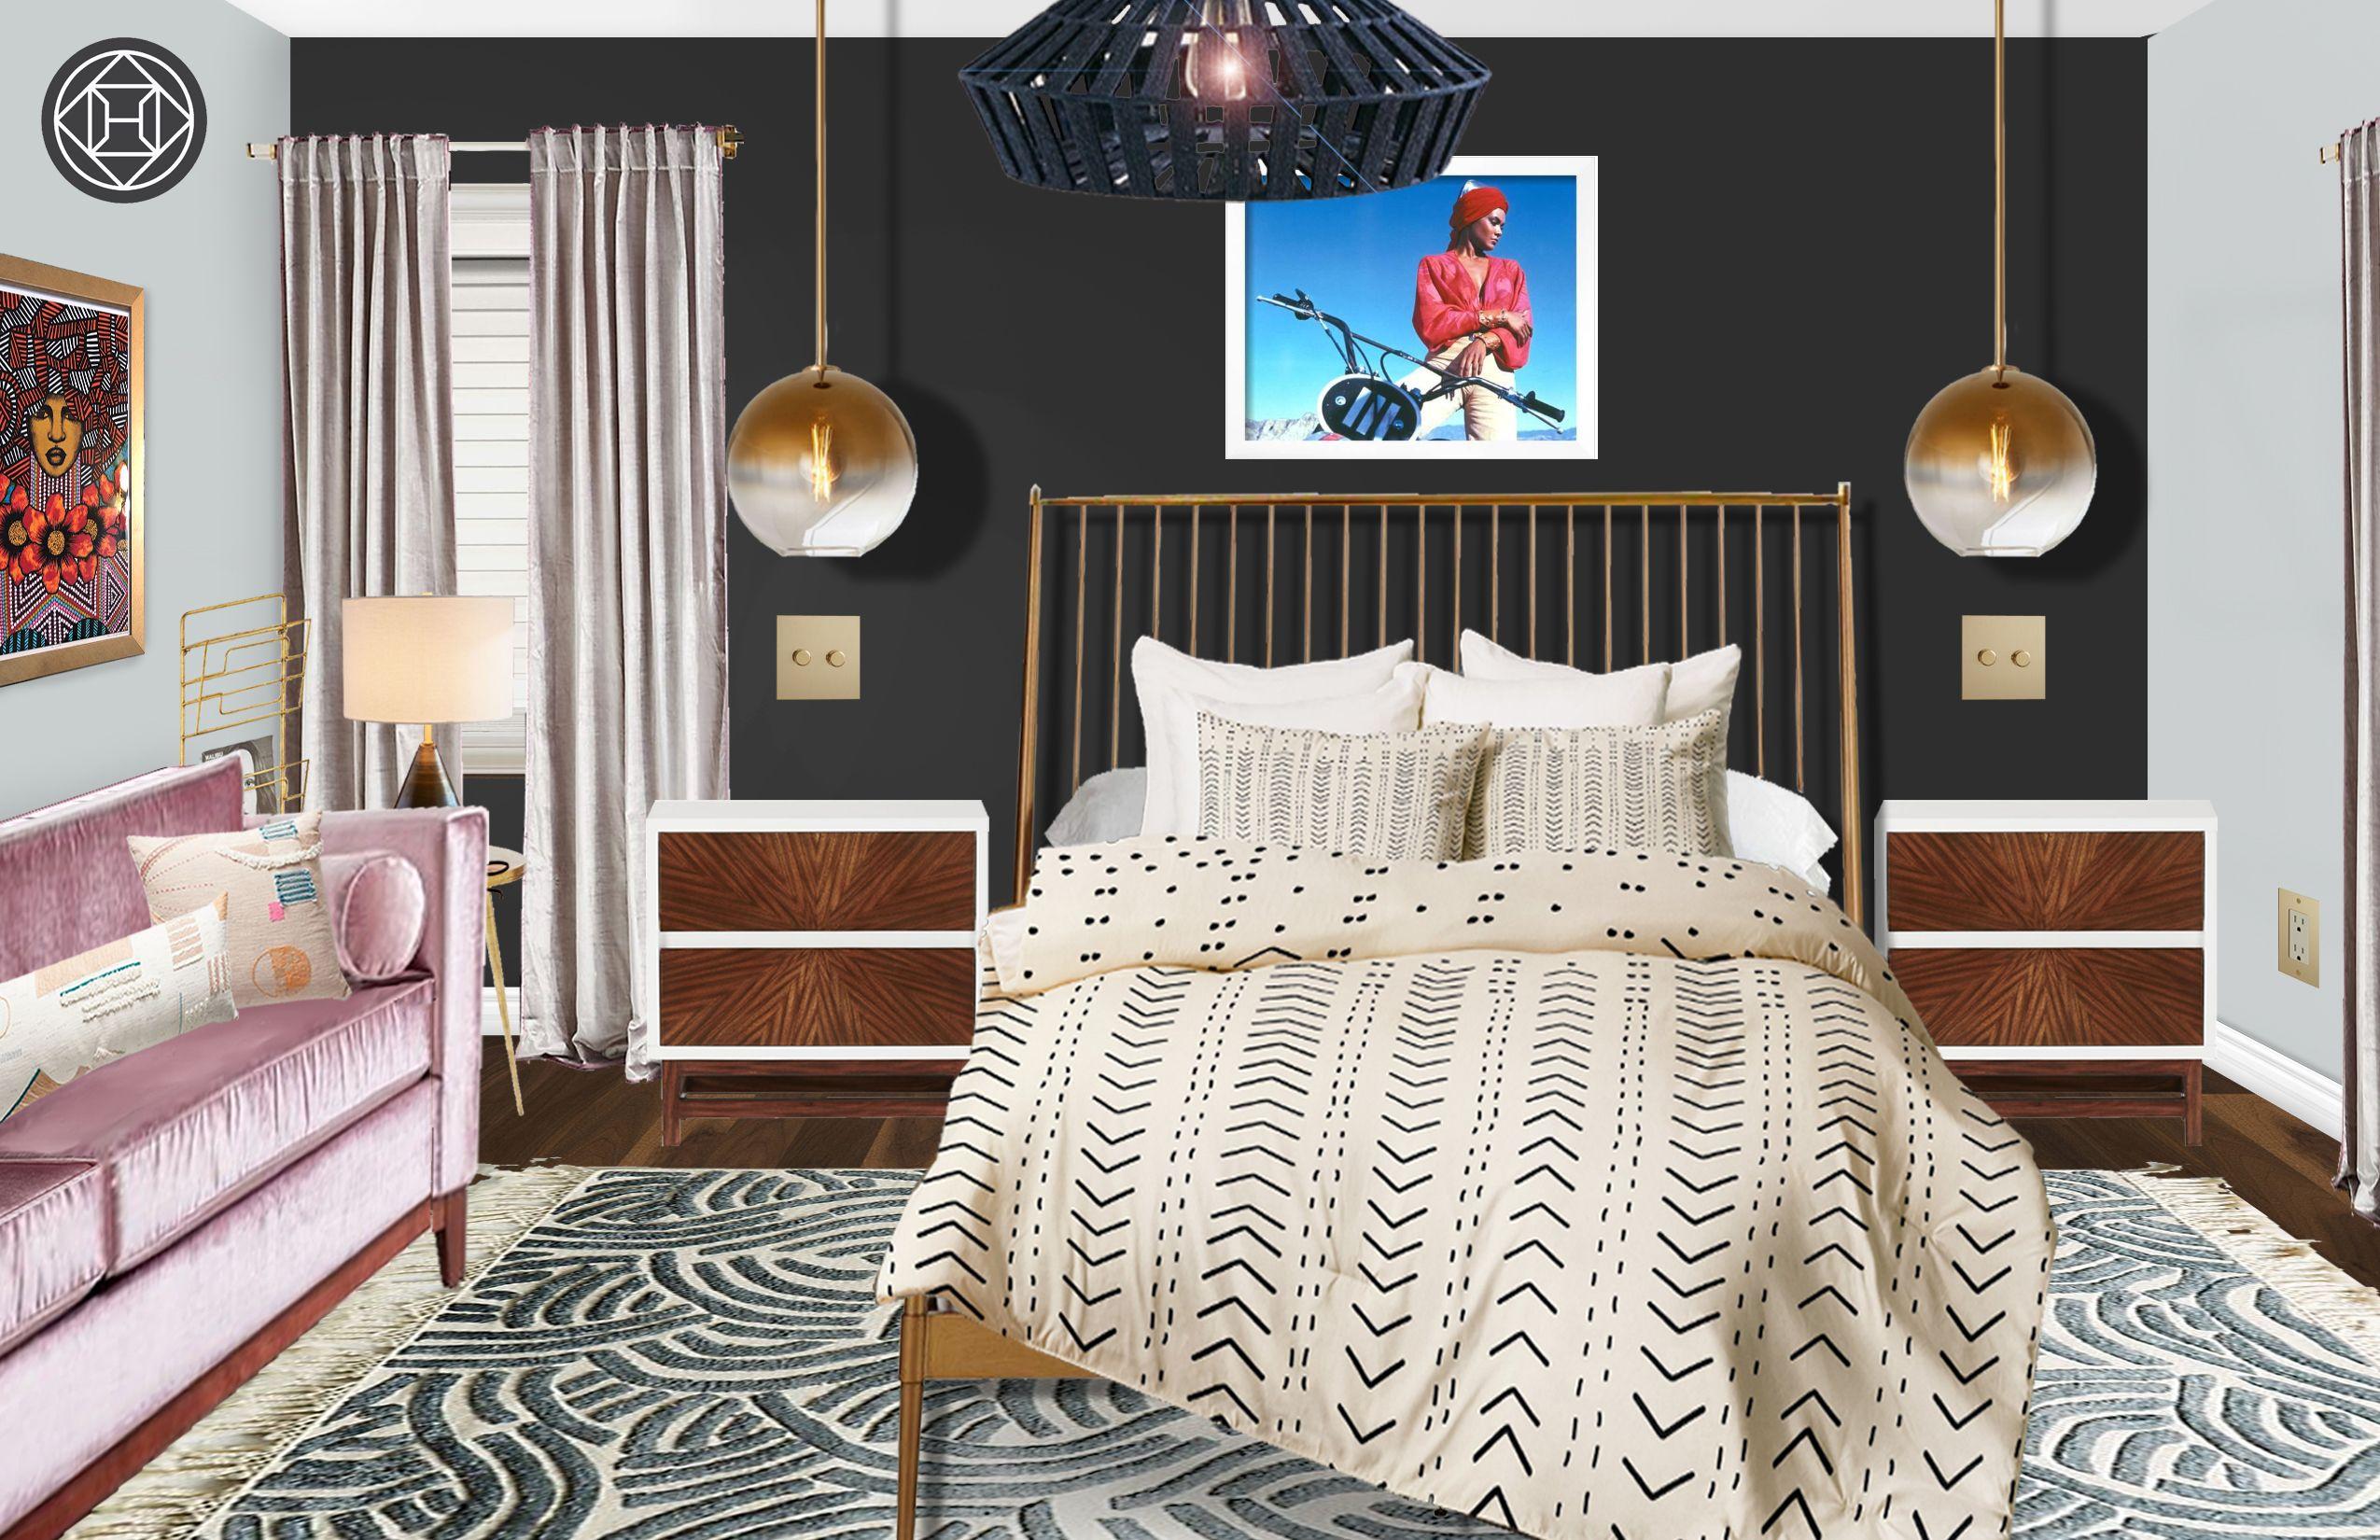 Best Eclectic Glam Global Midcentury Modern Bedroom Design 640 x 480